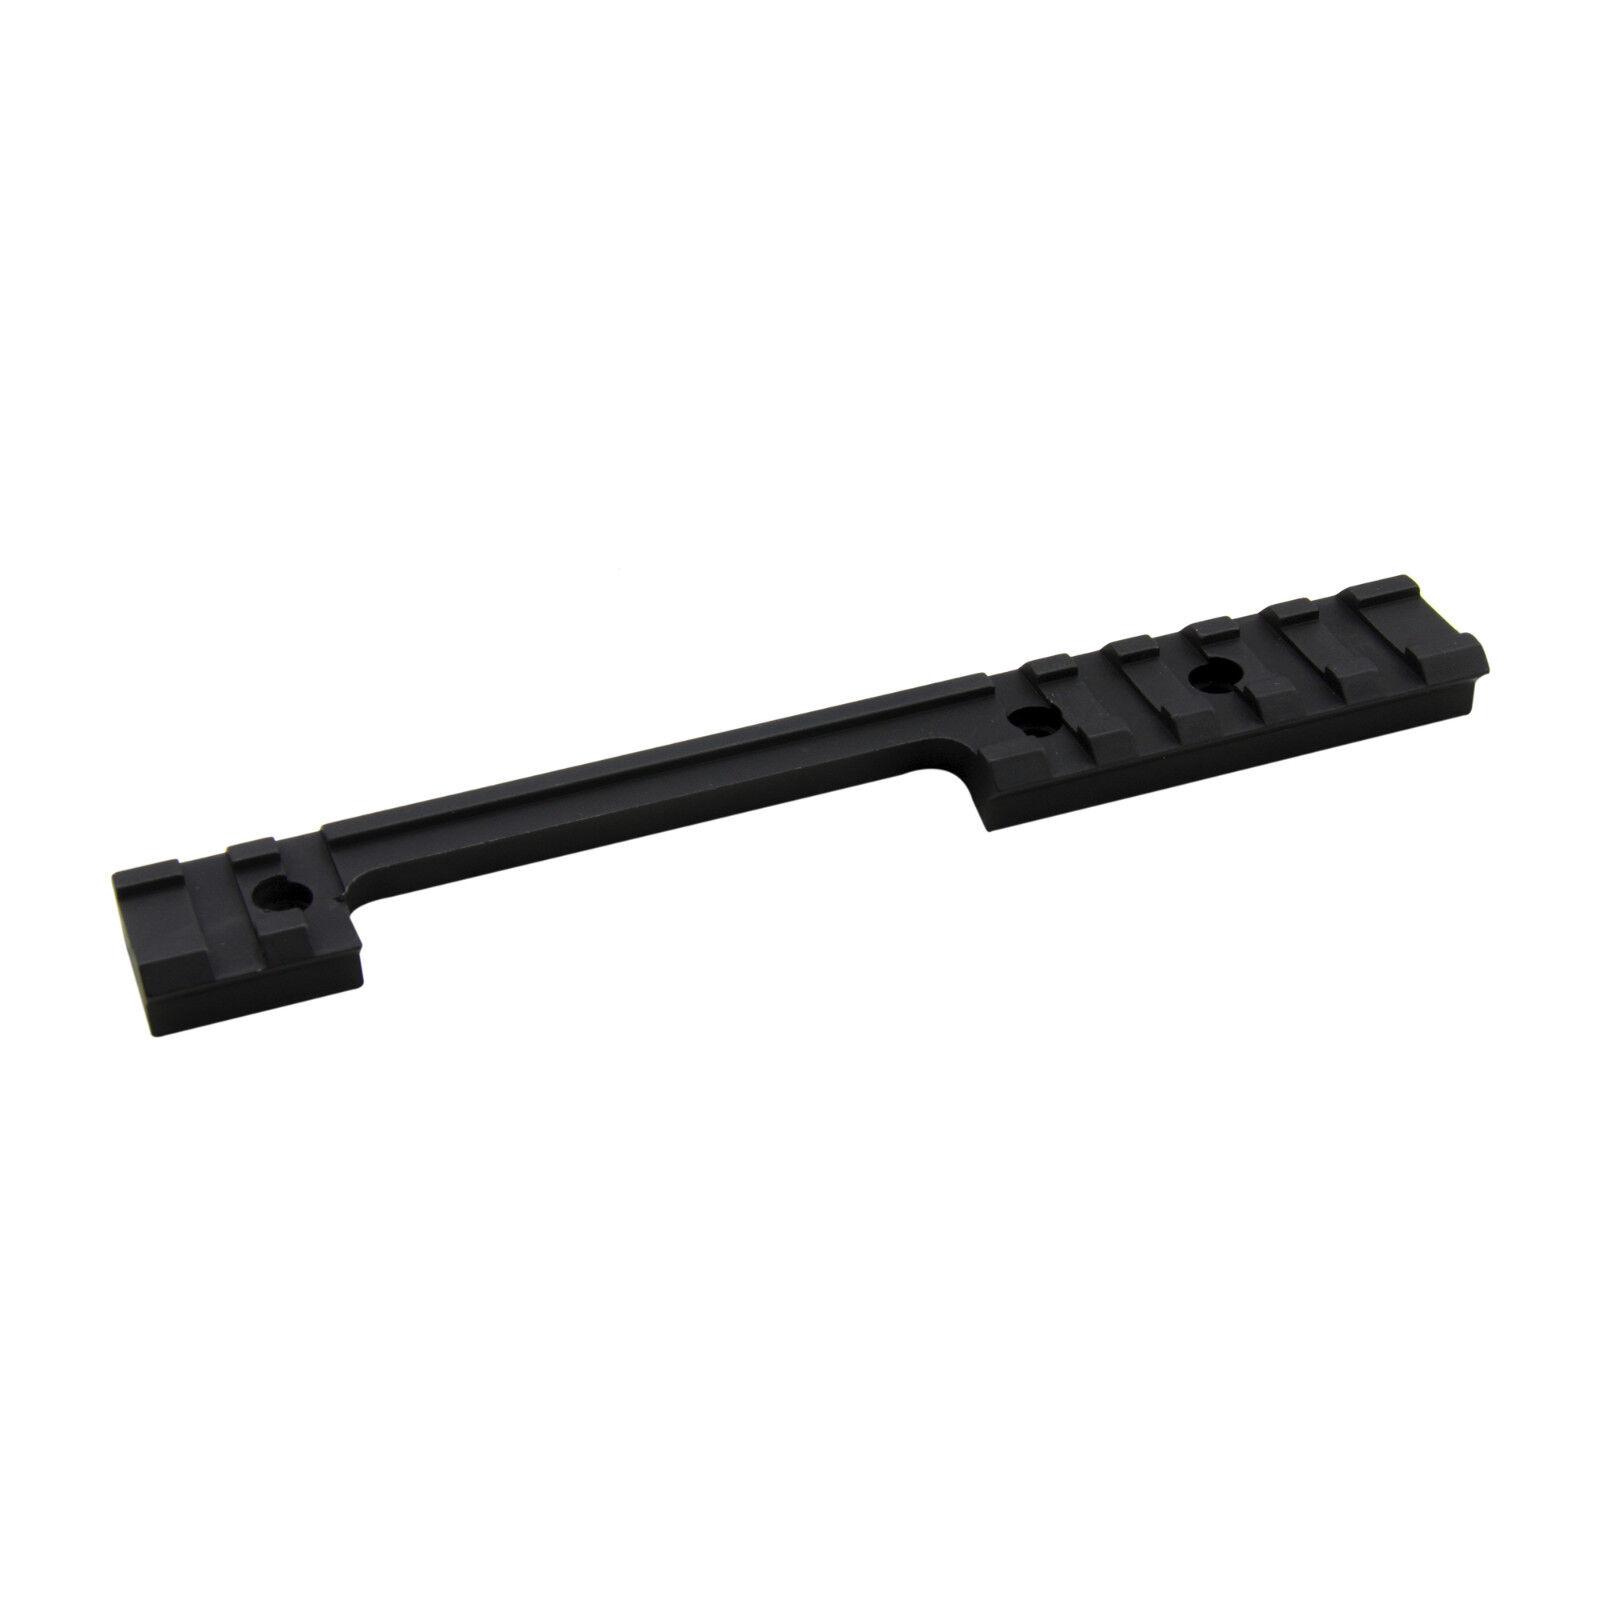 Sight base /& insert.. Remington Model 788